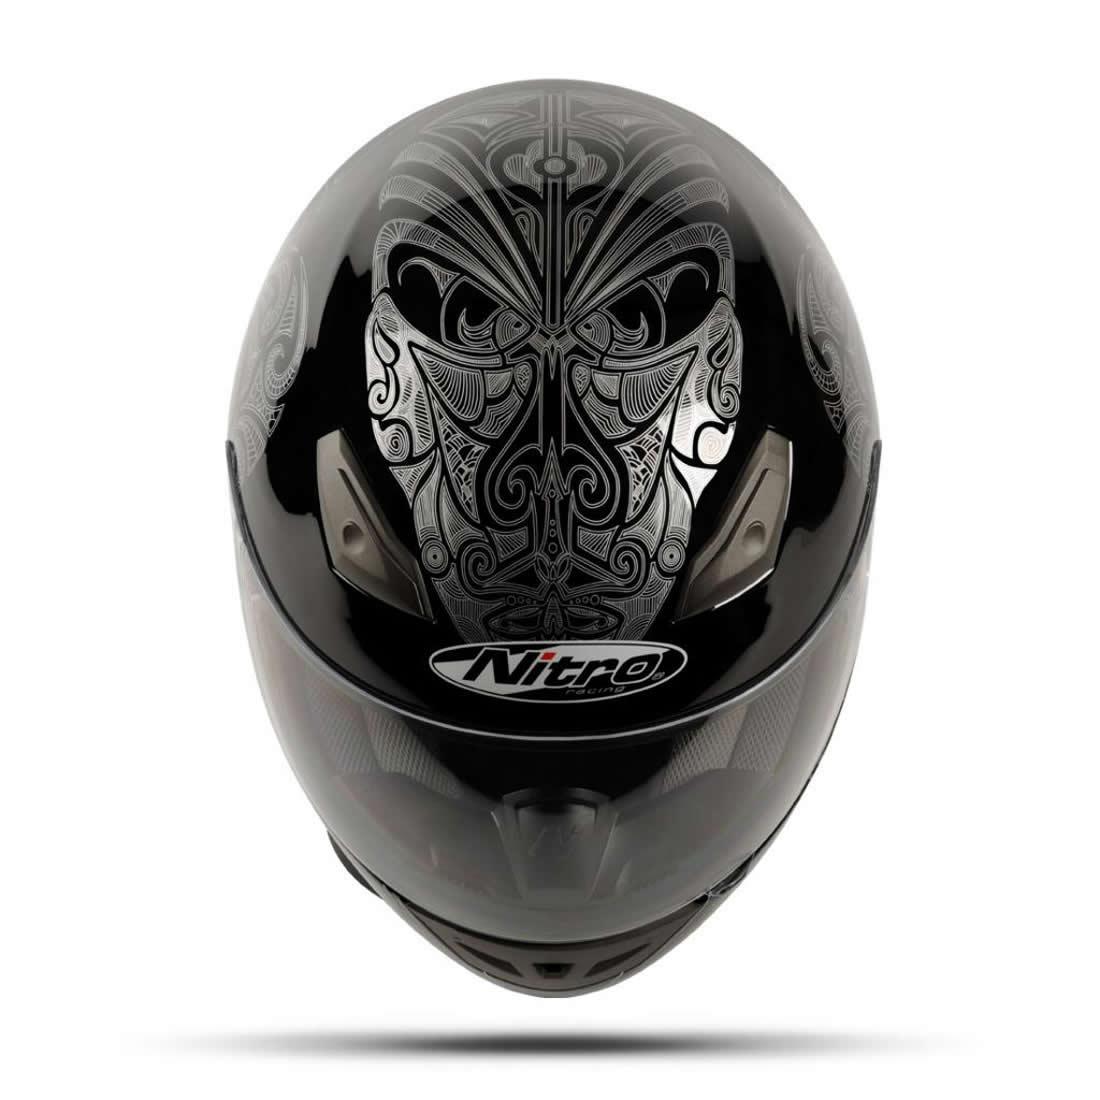 NITRO MOKO LUXE TRIBAL GRAPHIC TATTOO FULL FACE MOTORCYCLE  : 8951 Nitro Moko Luxe Motorcycle Helmet Black 1100 2 <strong>Street Bike</strong> Helmets from www.ebay.com size 1100 x 1100 jpeg 91kB